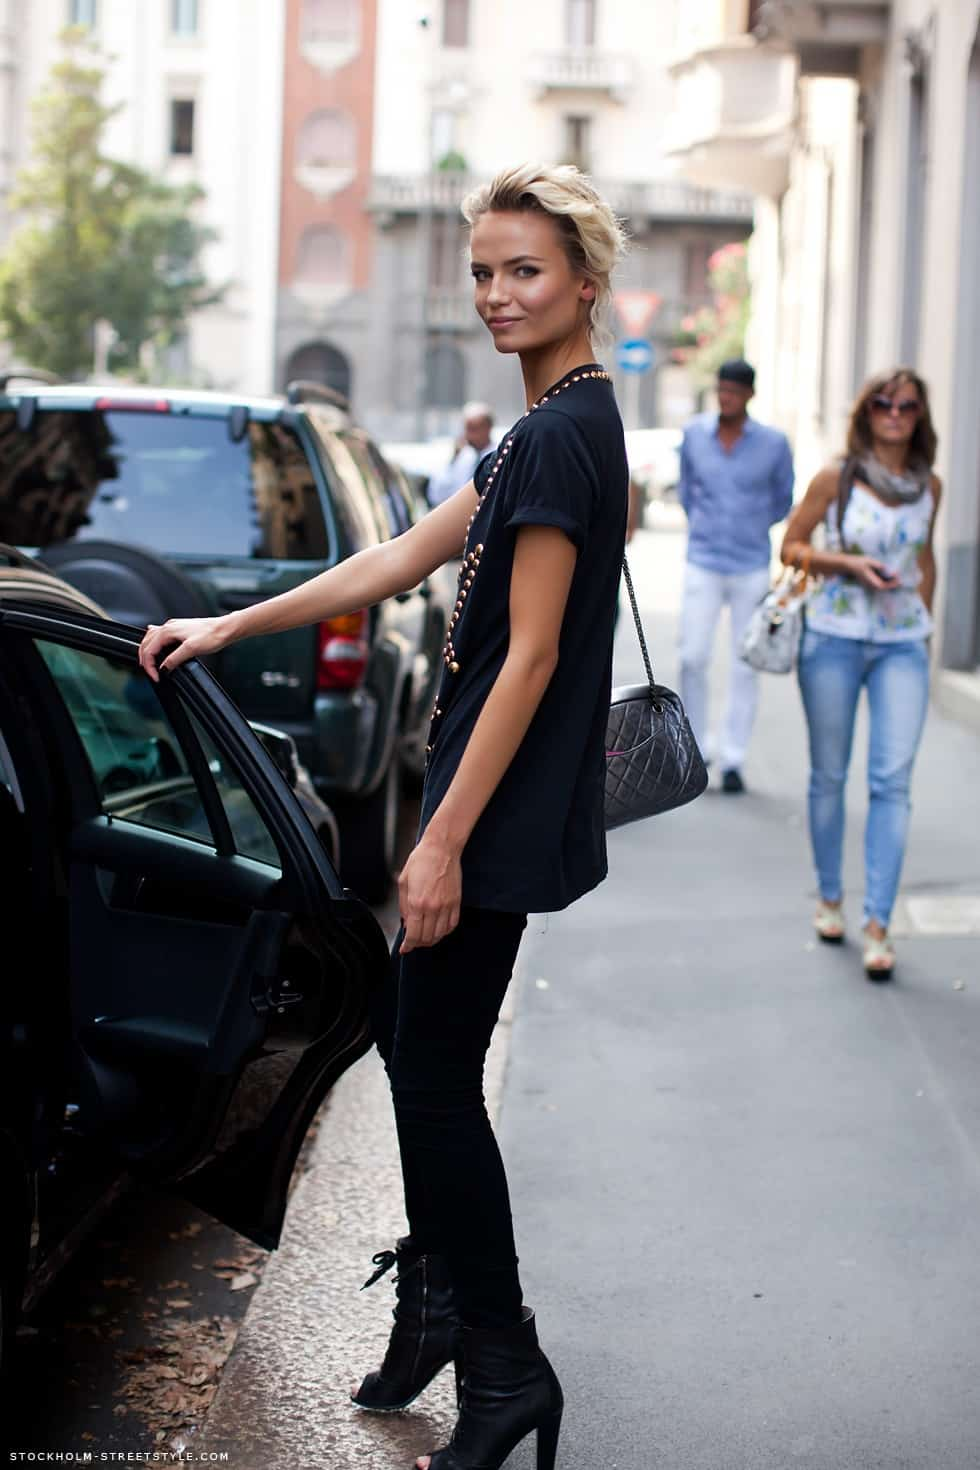 street-style-t-shirts (9)